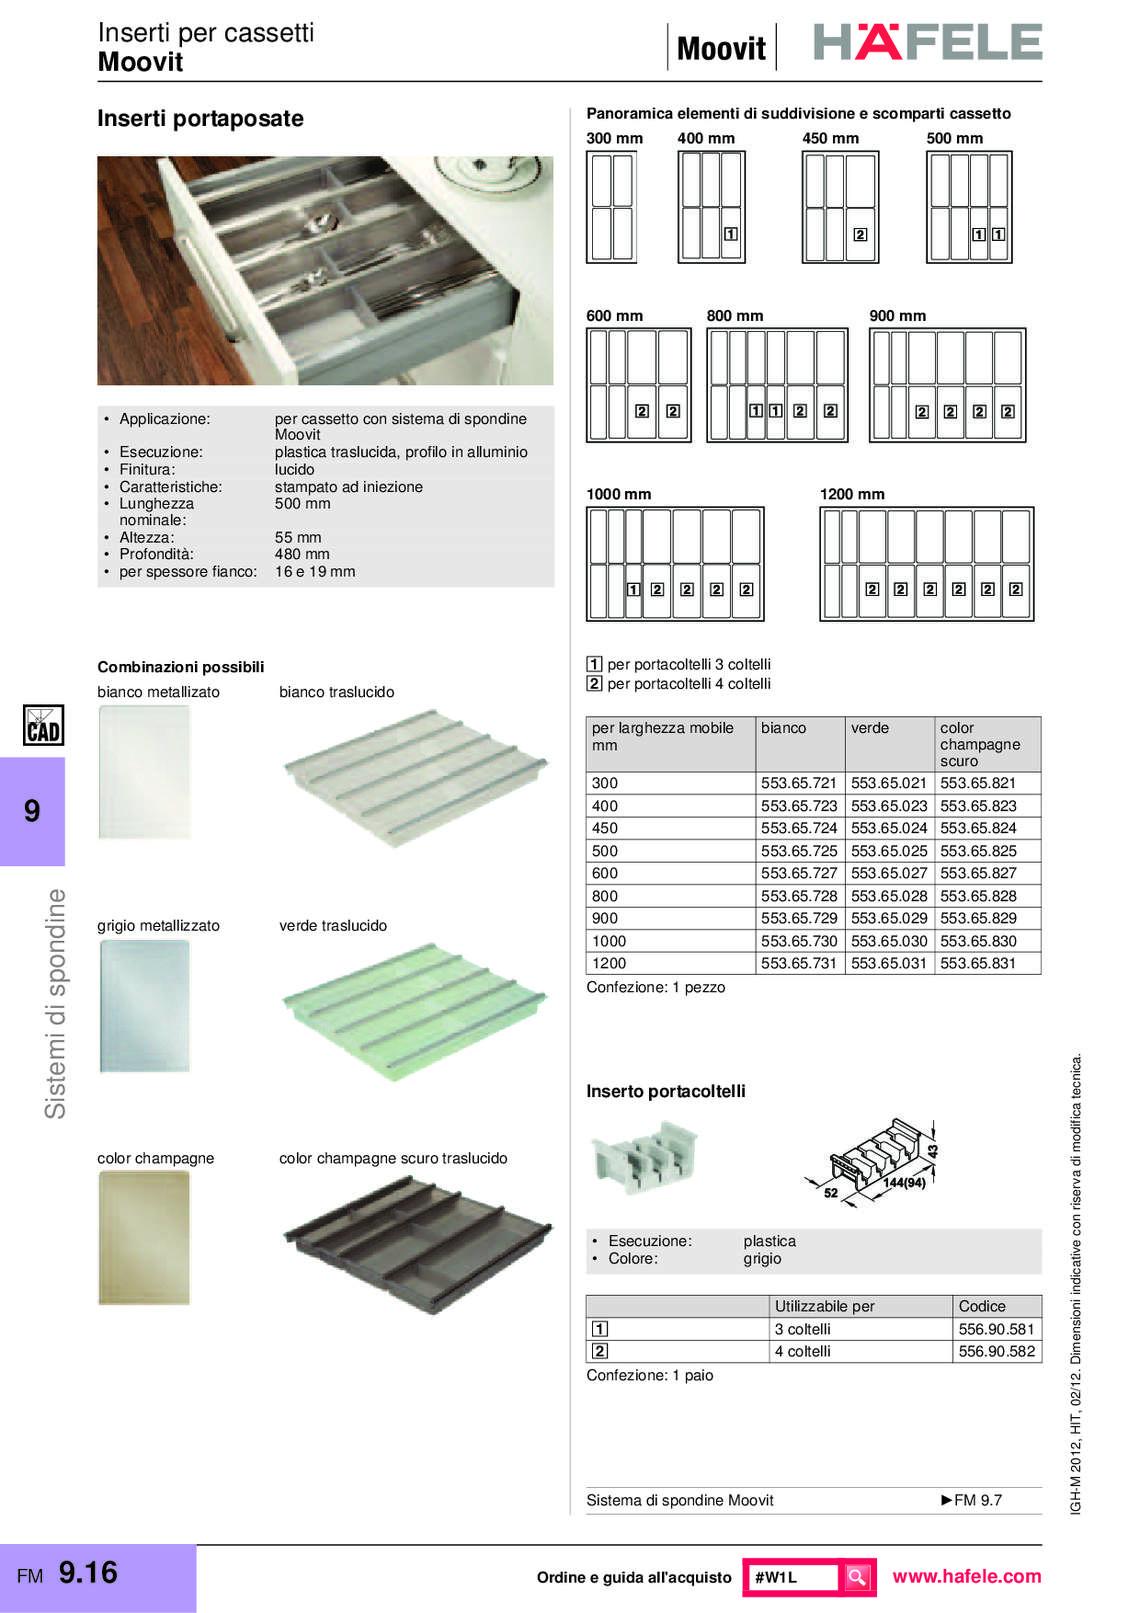 hafele-spondine-e-guide-per-mobili_40_029.jpg